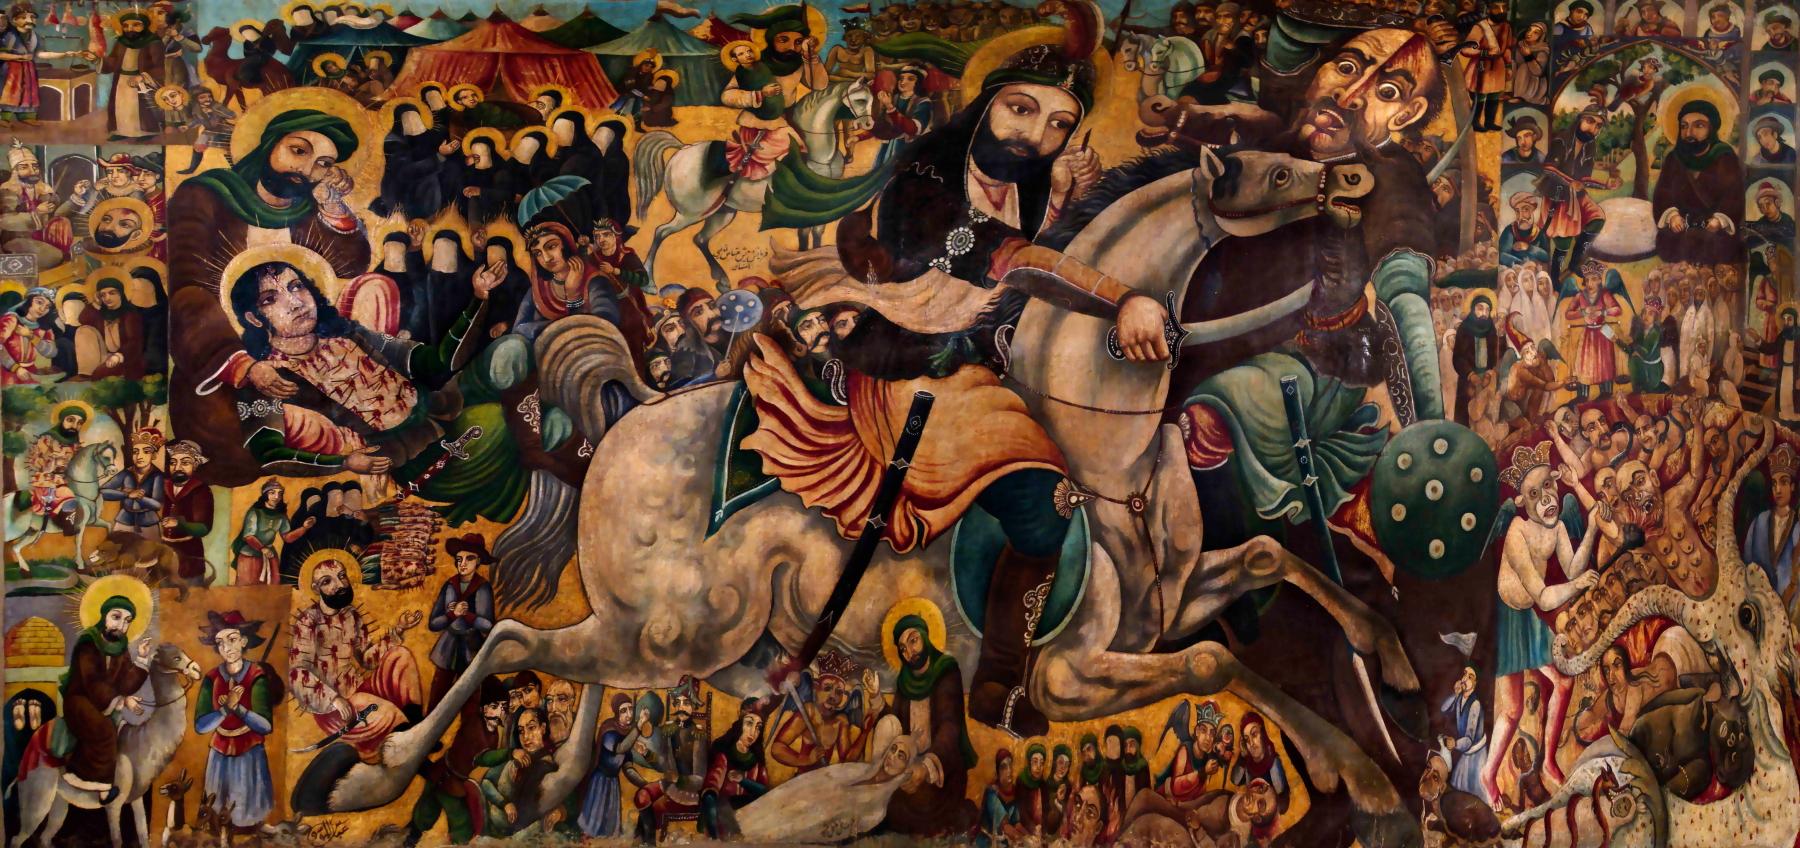 10 Oktober dalam Sejarah: Perpecahan Abadi Umat Islam Dimulai Hari Ini Ketika Hussein Terbunuh